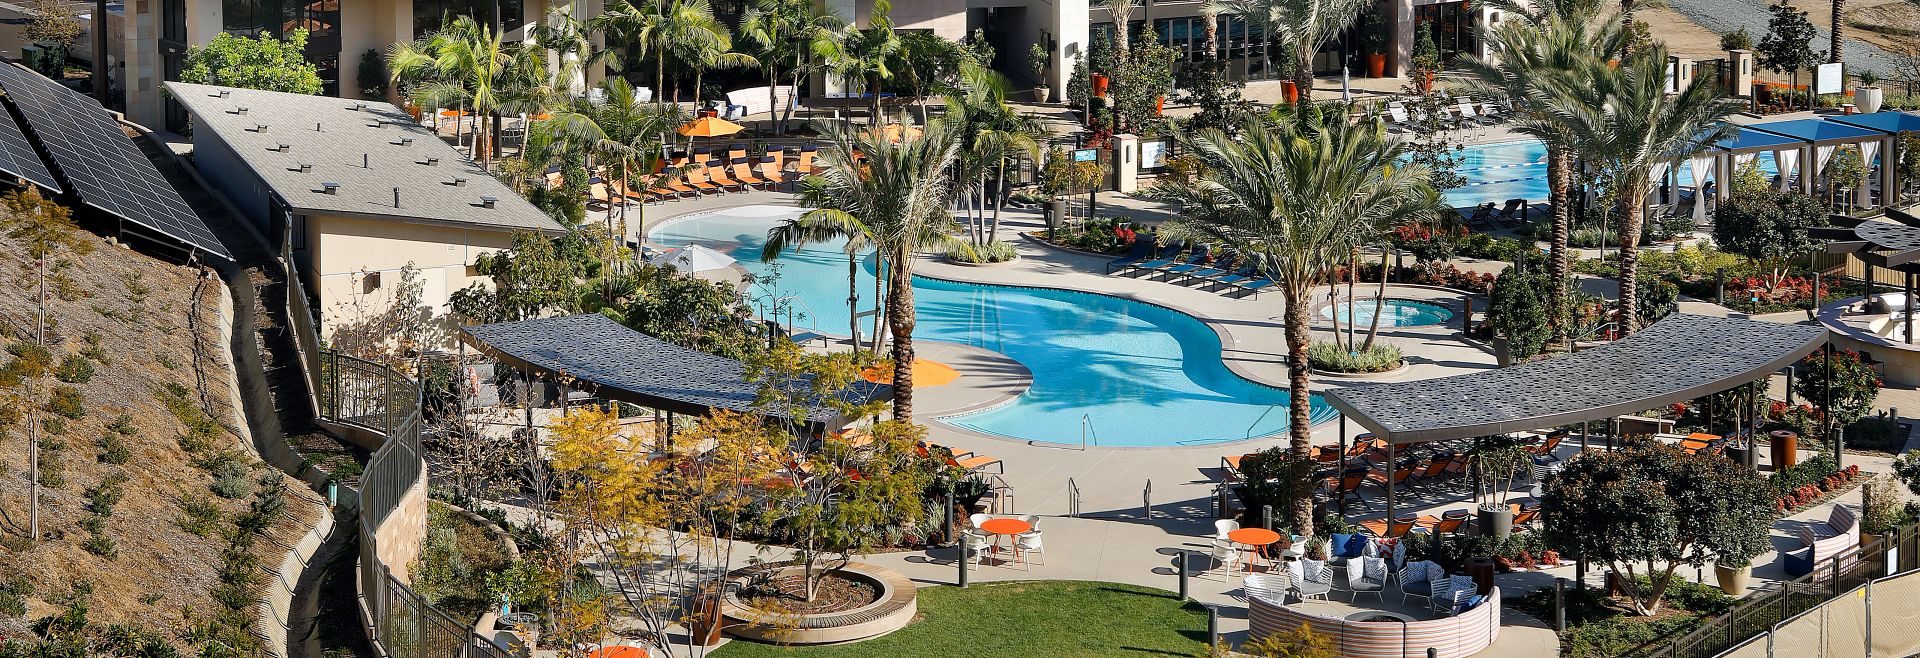 Civita recreation center and pools